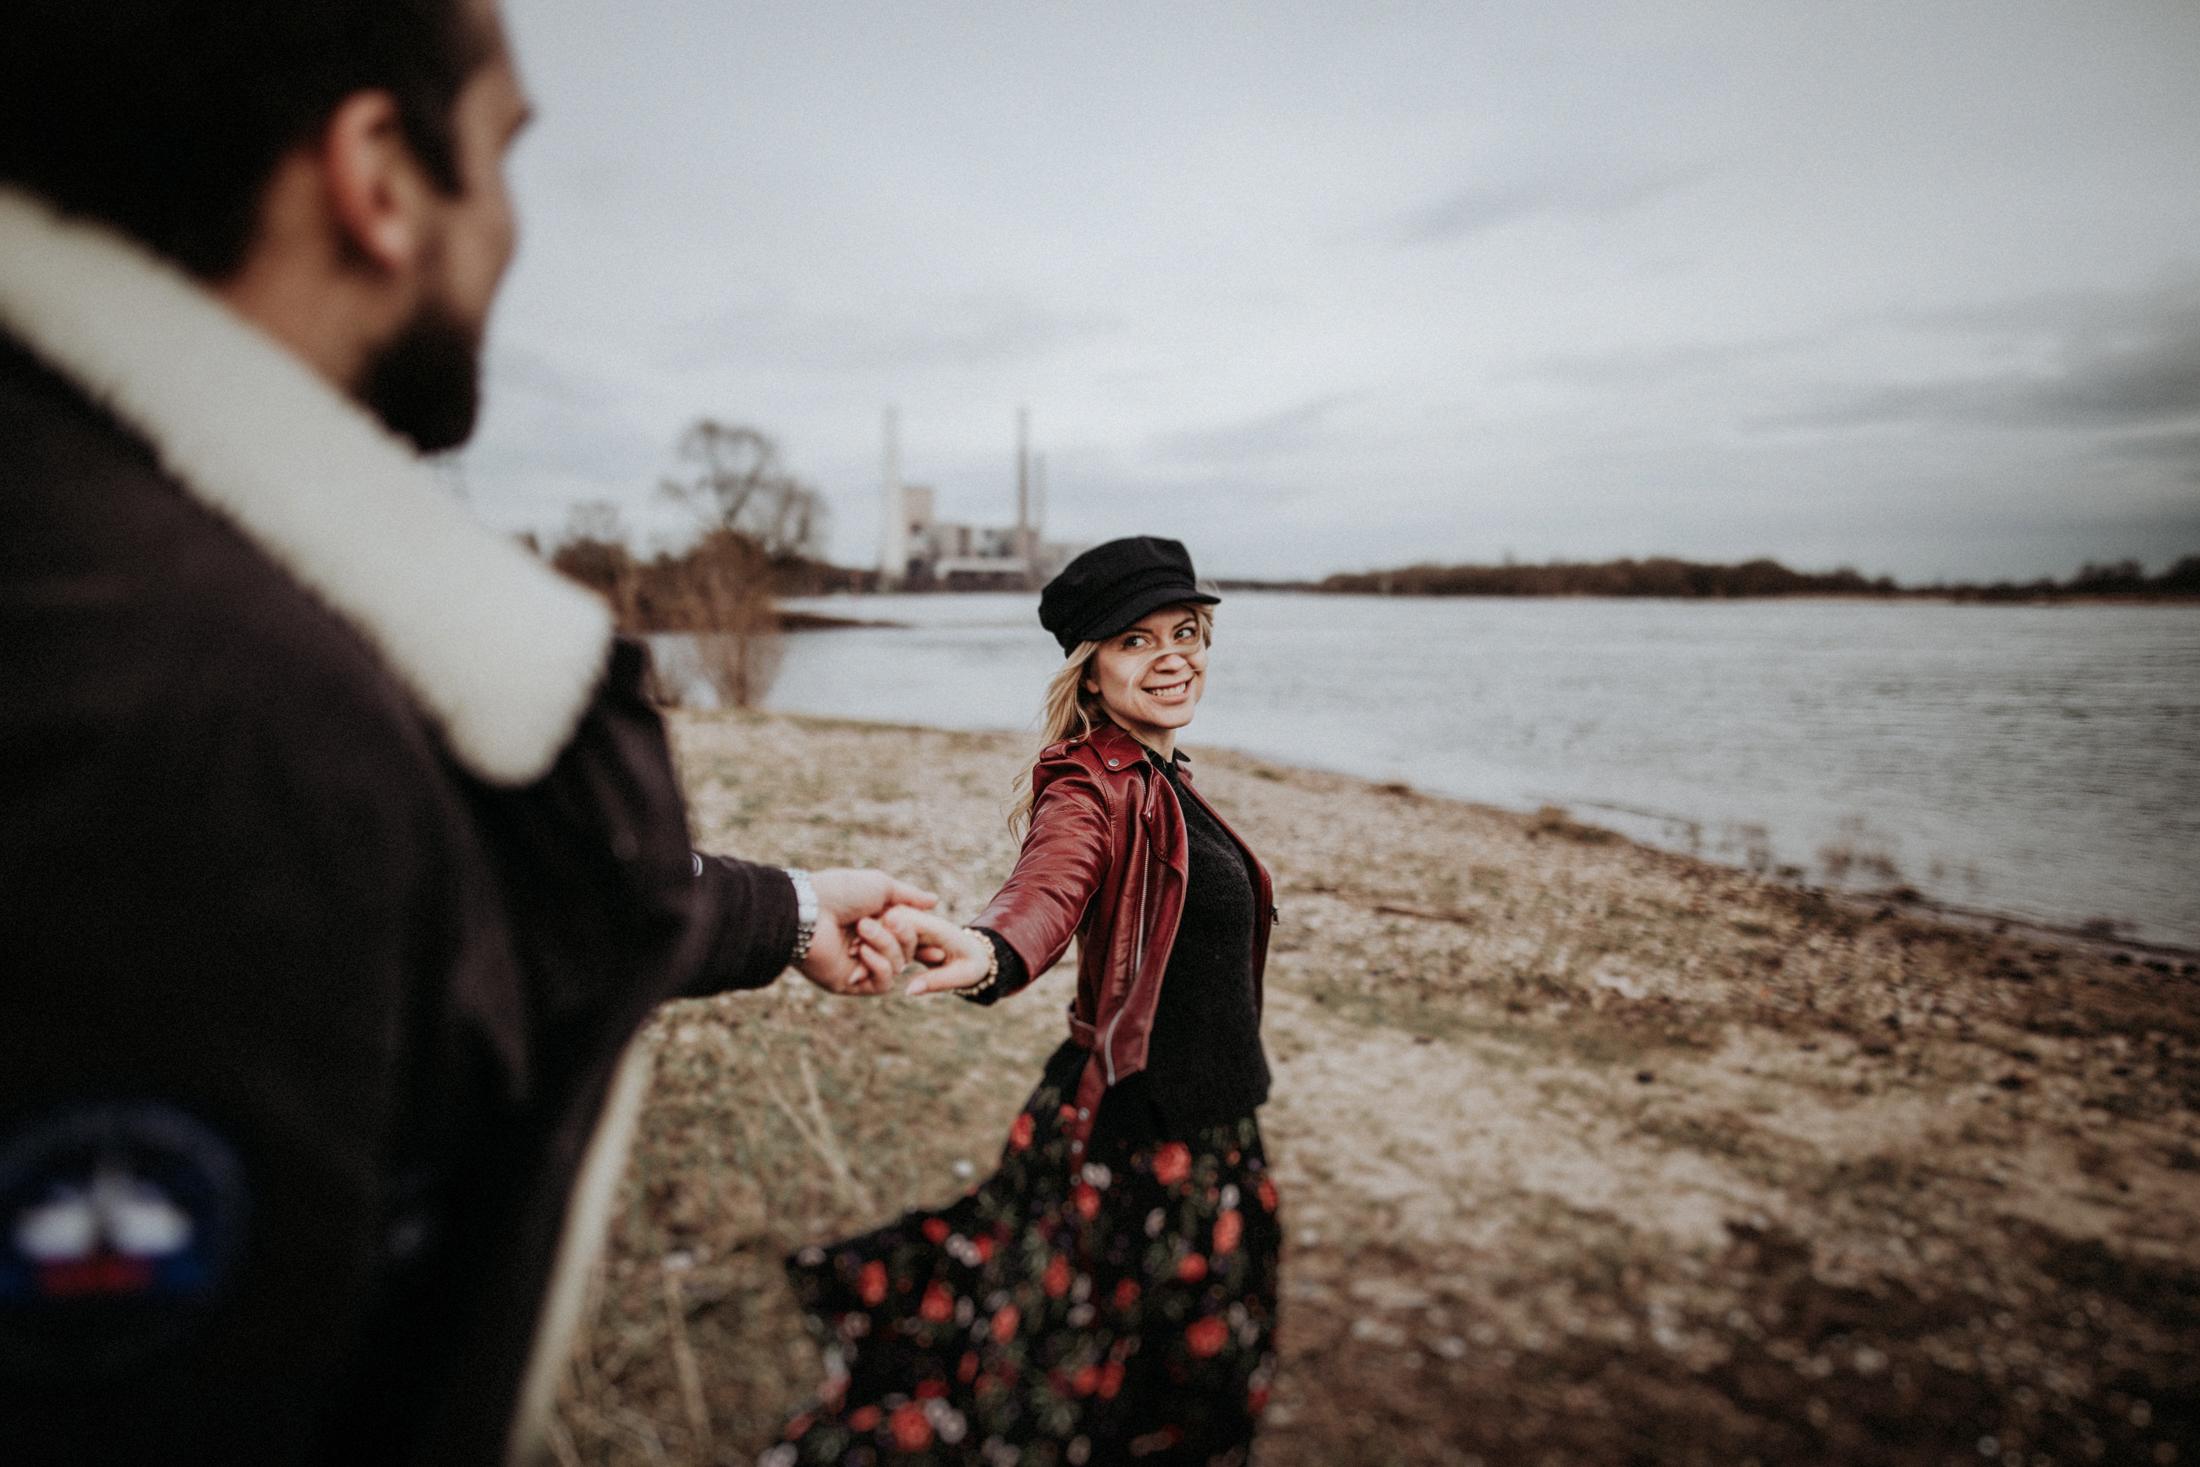 Wedding_Photographer_Mallorca_DanielaMarquardt_Photography_CanaryIslands_Lanzarote_Iceland_Tuscany_Santorini_Portugal_NewYork_Spain_Elopement_Hochzeitsfotograf_CK123